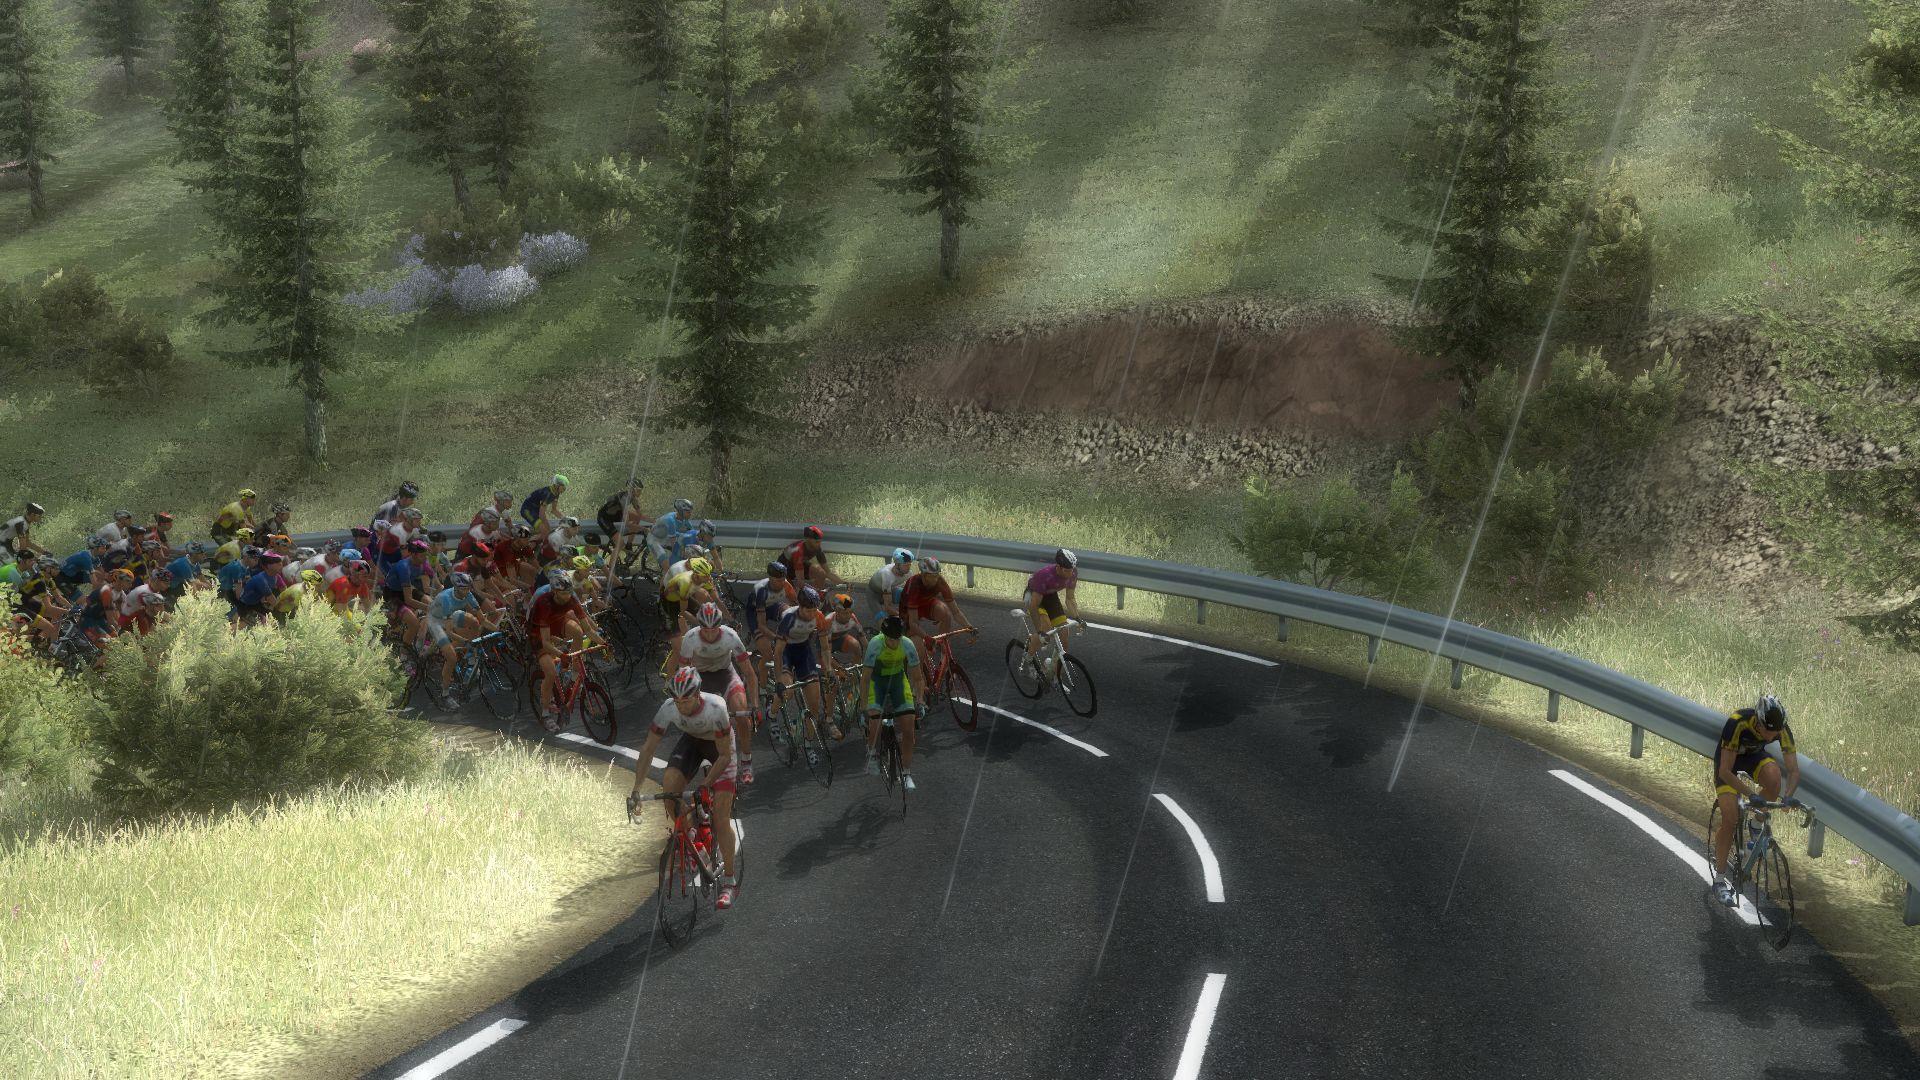 pcmdaily.com/images/mg/2020/Reports/GTM/Giro/S12/mg20_giro_s12_46.jpg